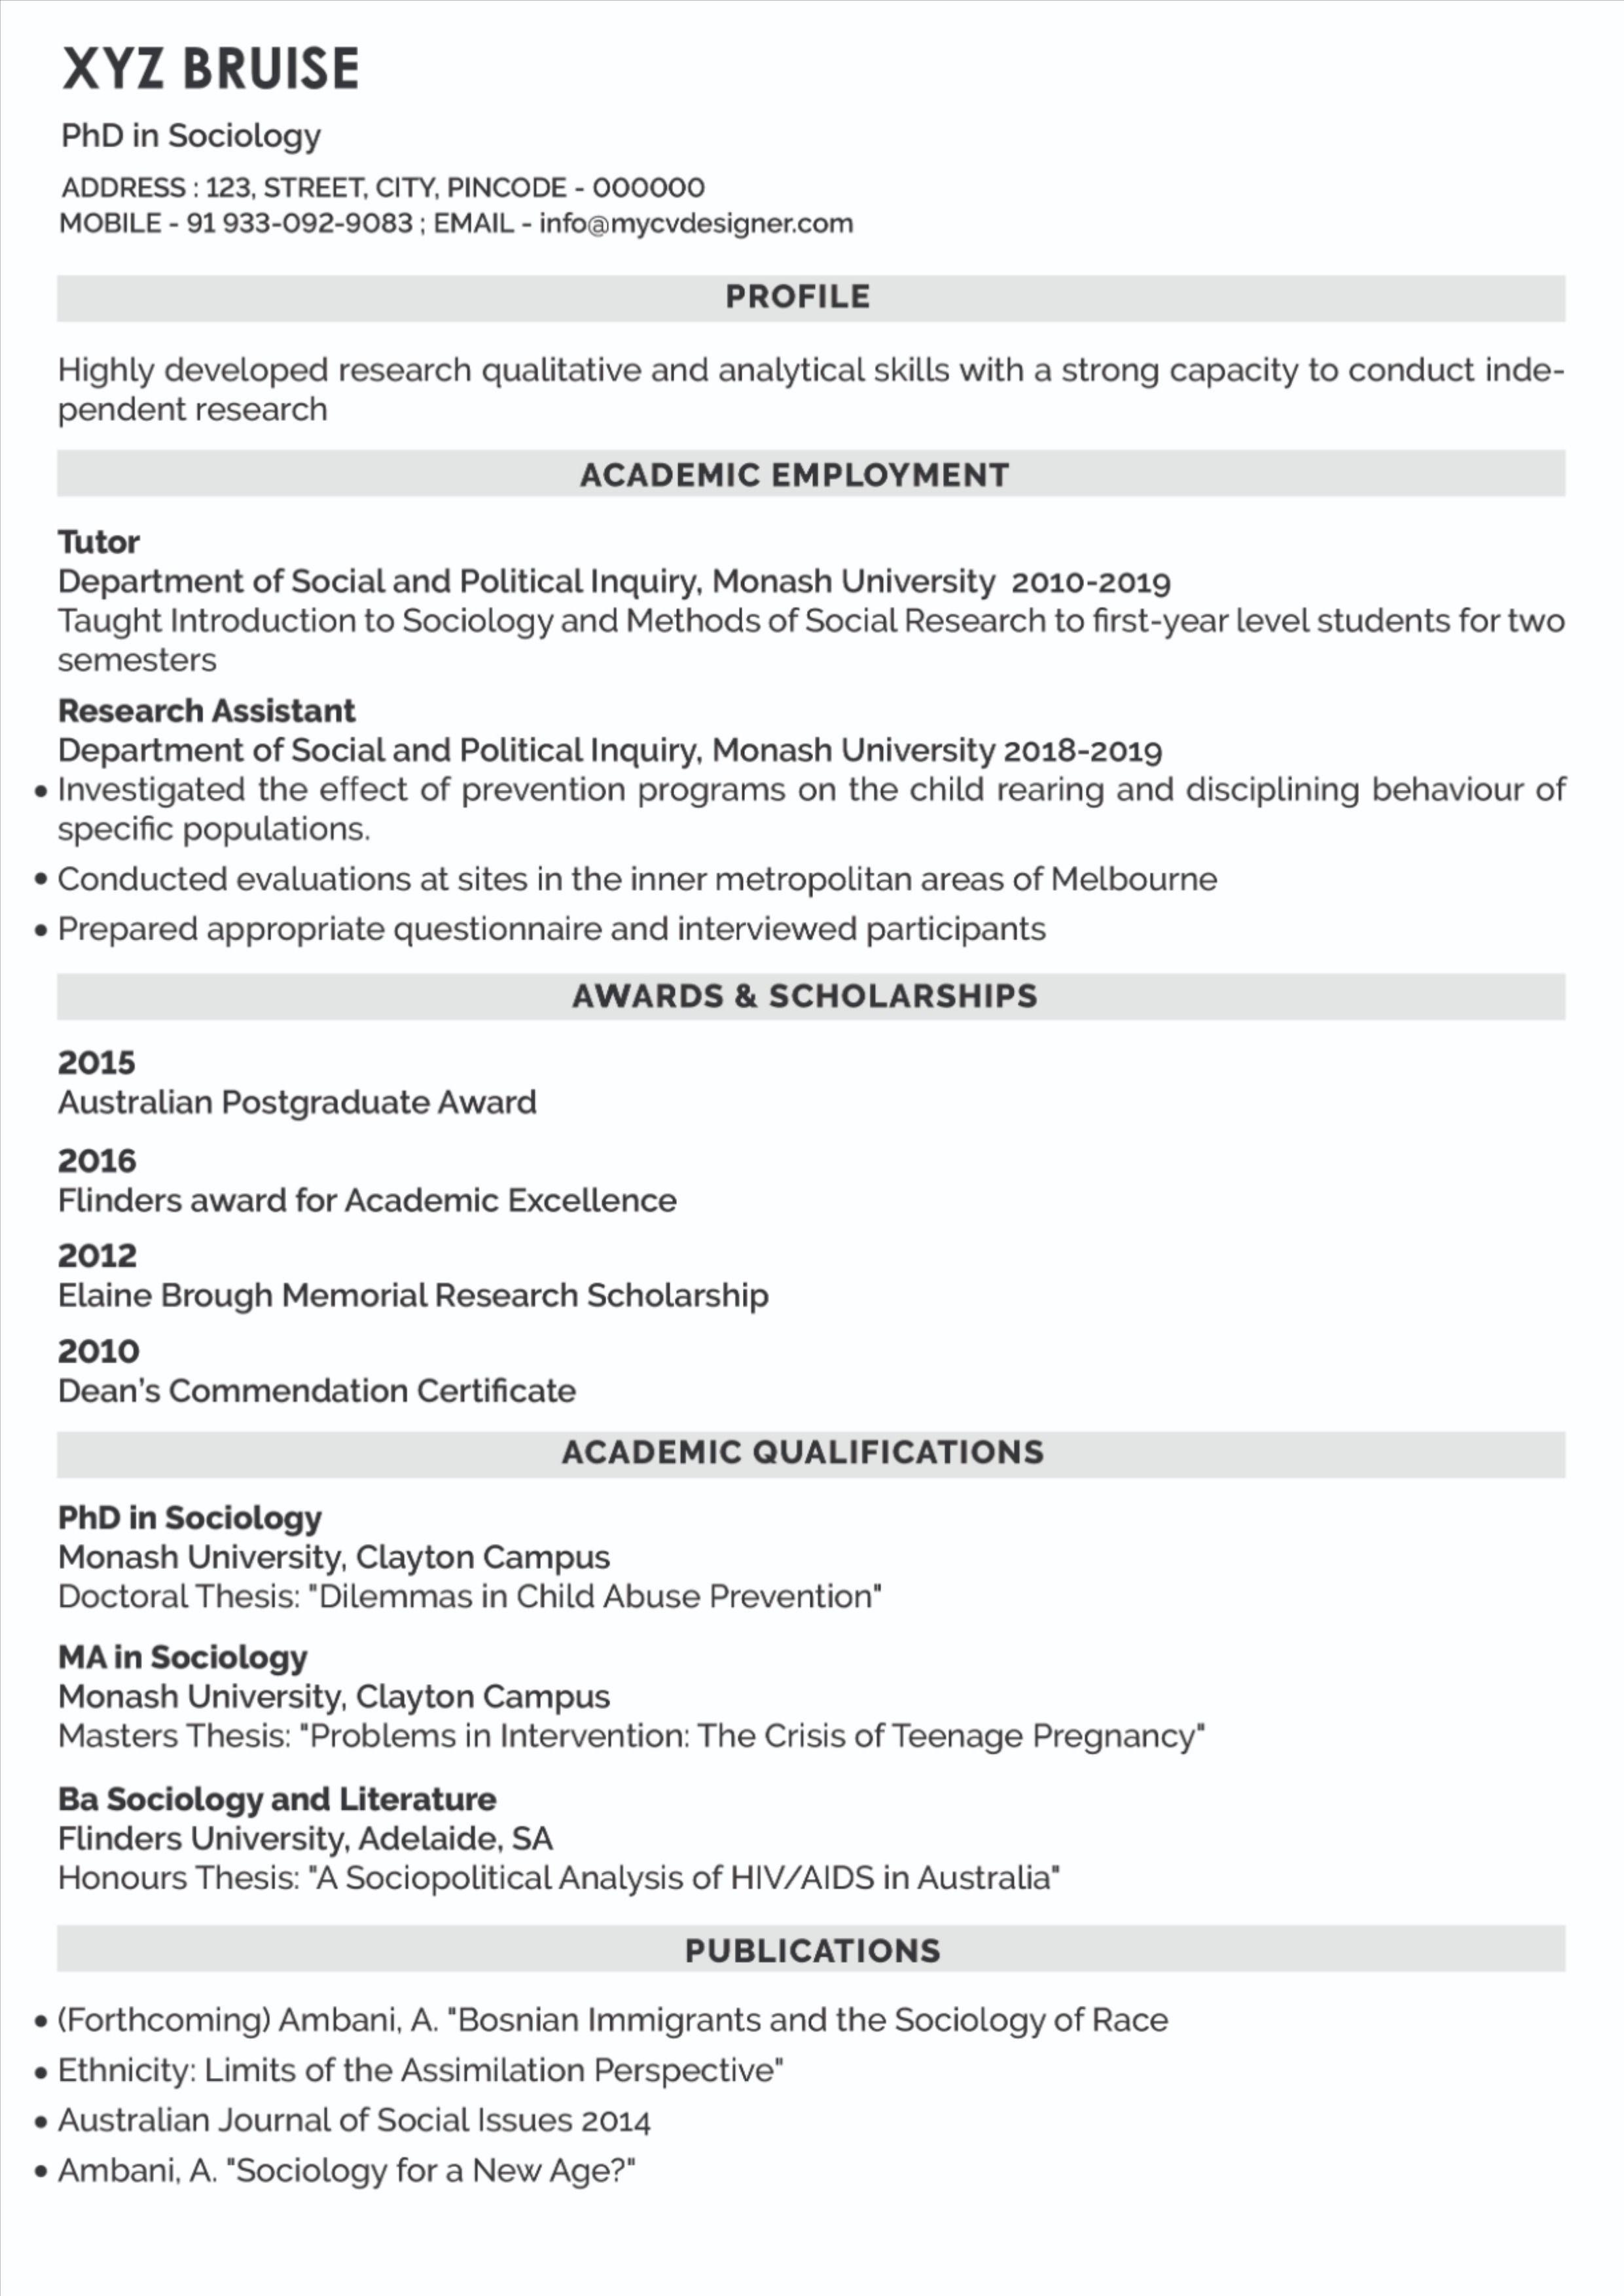 Text CV/Resume Resume, Hiring process, Texts